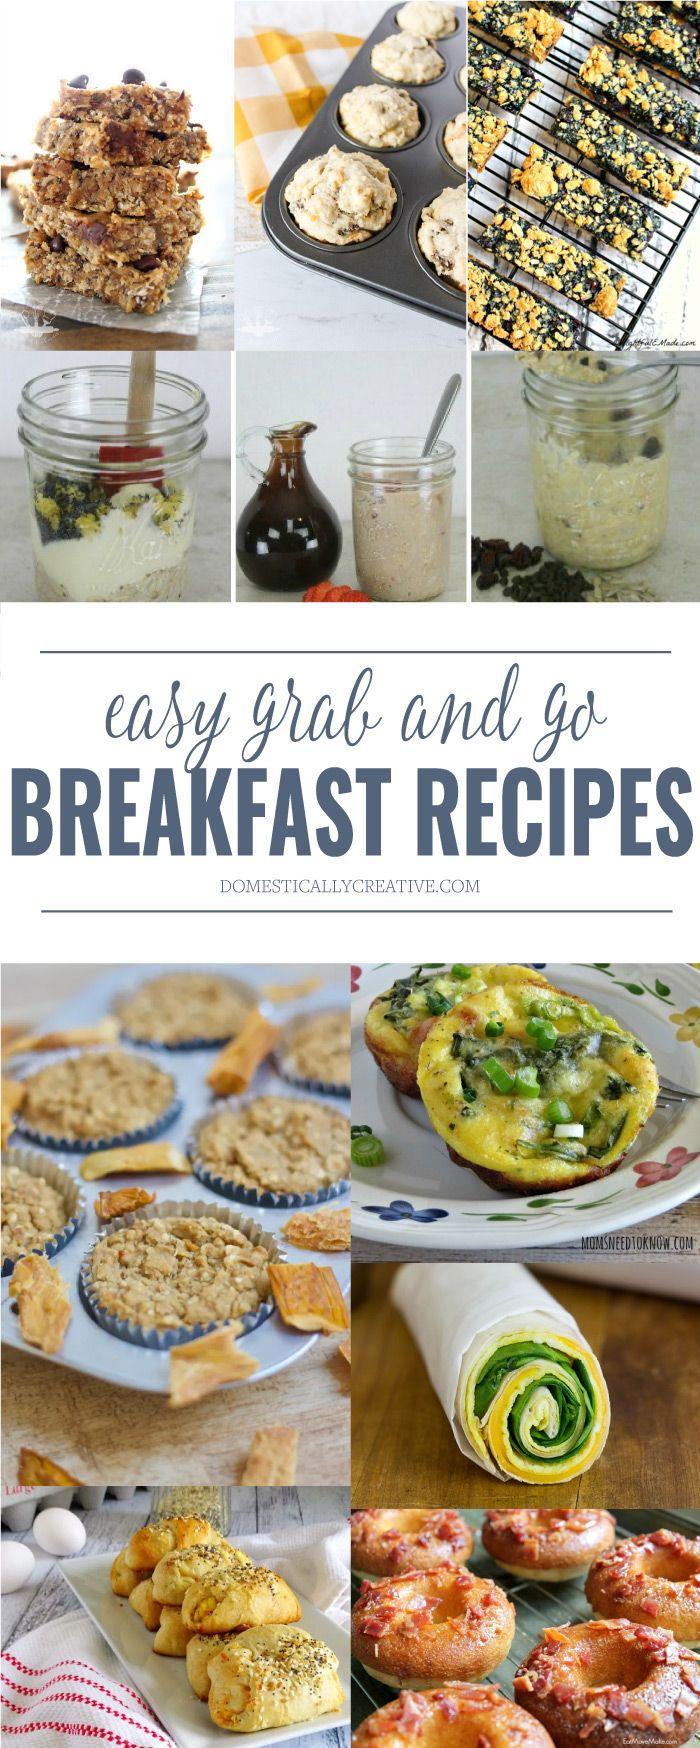 Easy Grab And Go Breakfast Recipes Breakfast Recipes Breakfast Recipes Easy Recipes